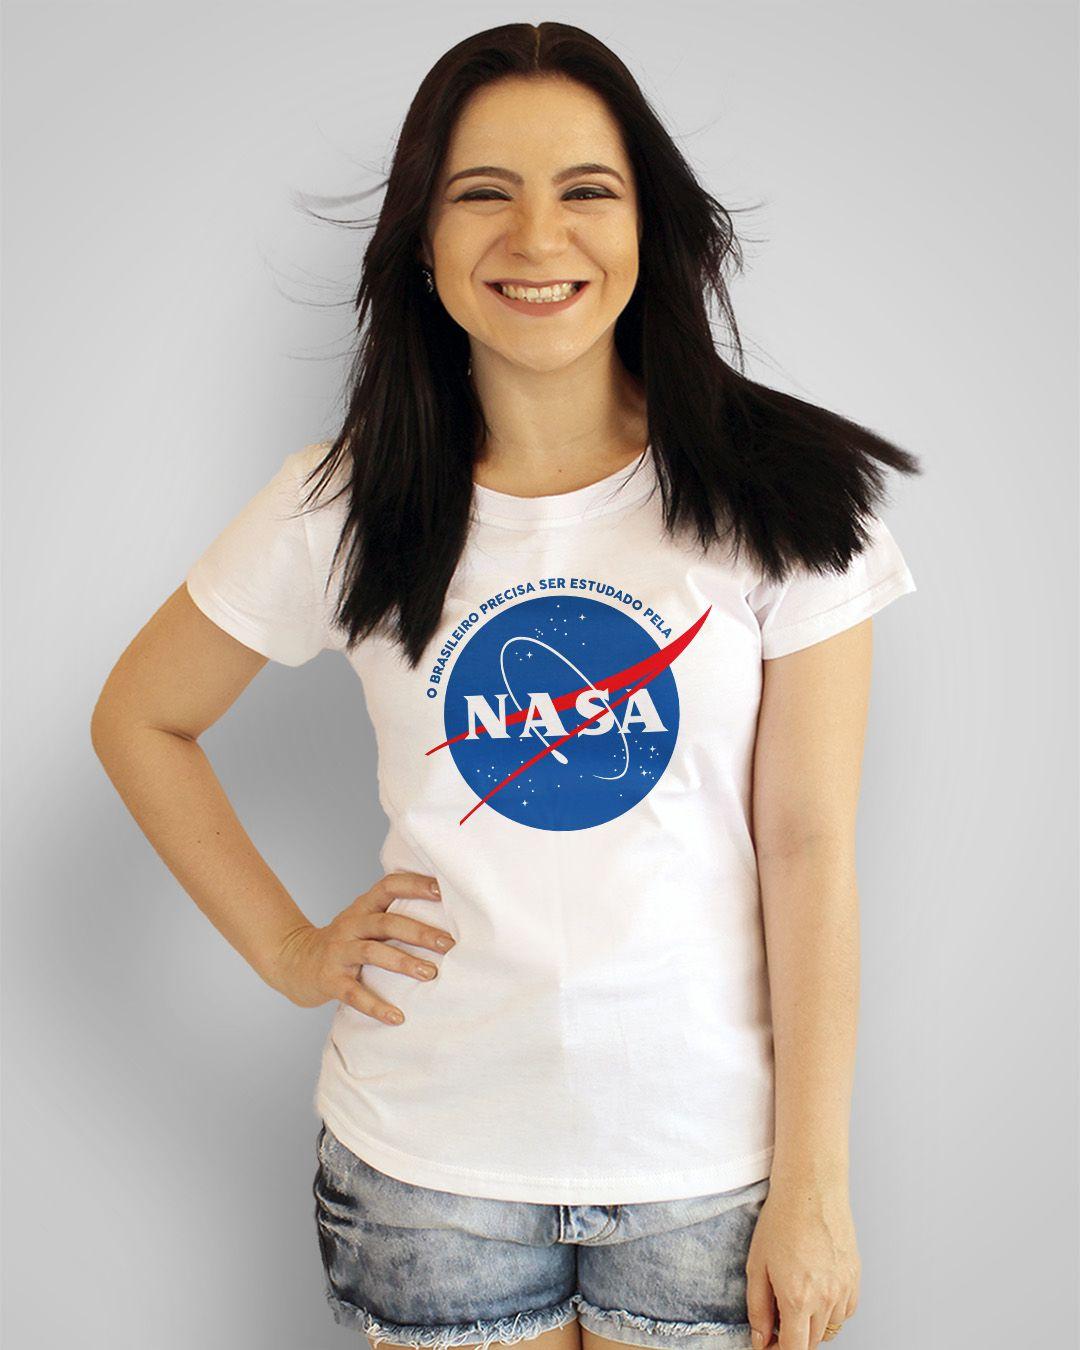 Camiseta O brasileiro precisa ser estudado pela Nasa